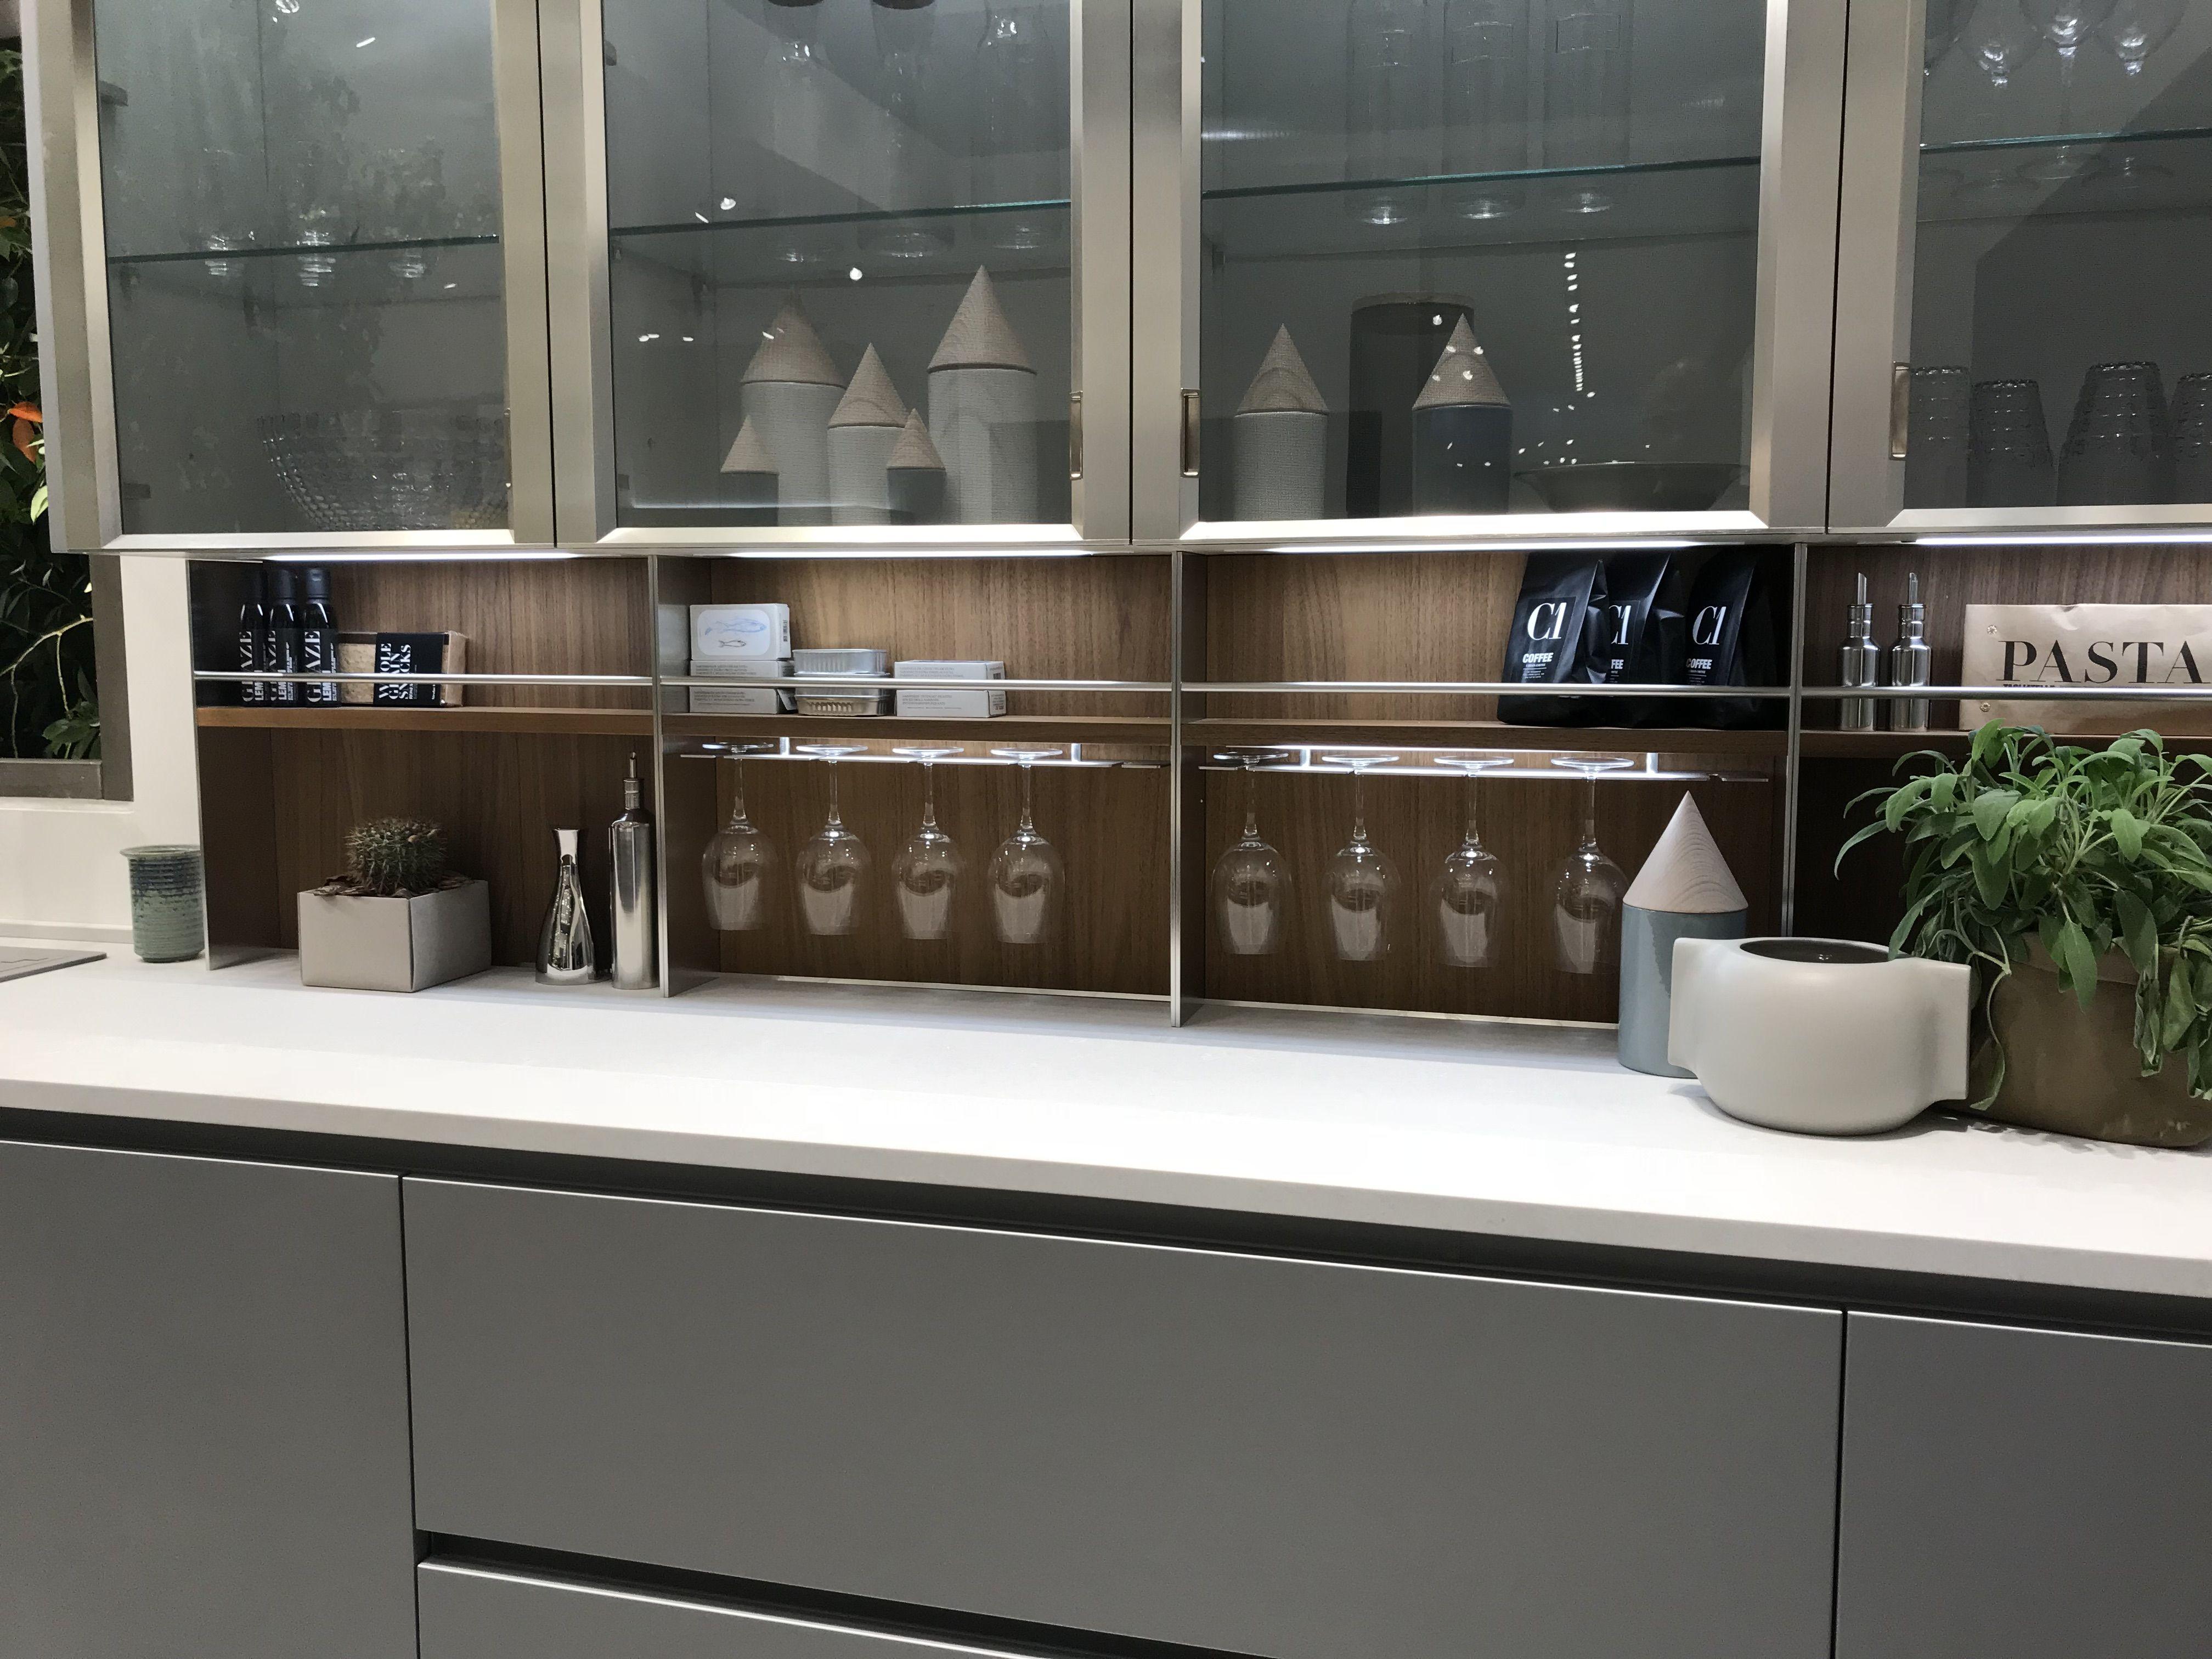 Cuisine Veneta Cucine Modele Artemisia Eurocucina2018 Venetacucine Venetacucinefrance Kitchens Salonedelmobile2018 Cuisine Moderne Cuisine Design Italien